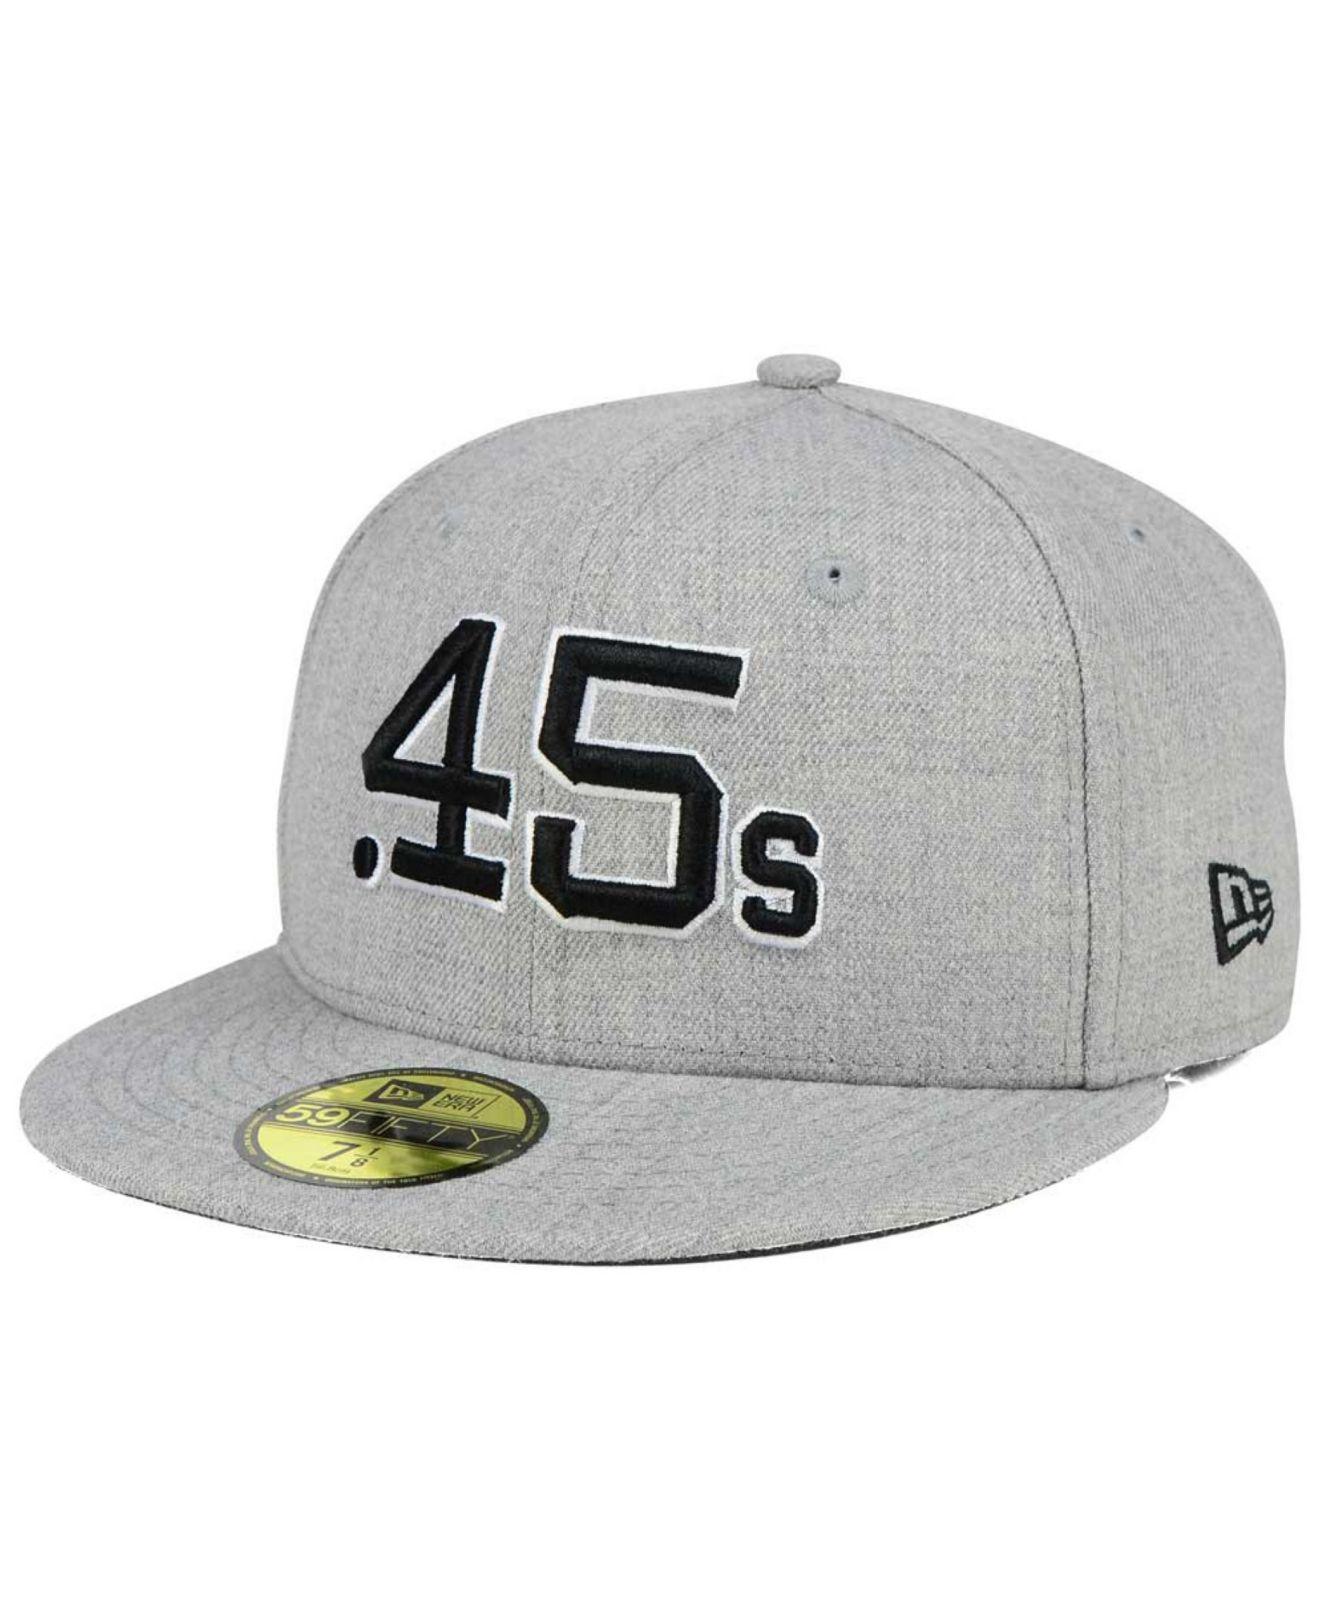 ee8b2ec3e49 ... low price lyst ktz houston colt .45s heather black white 59fifty cap in  gray 05724